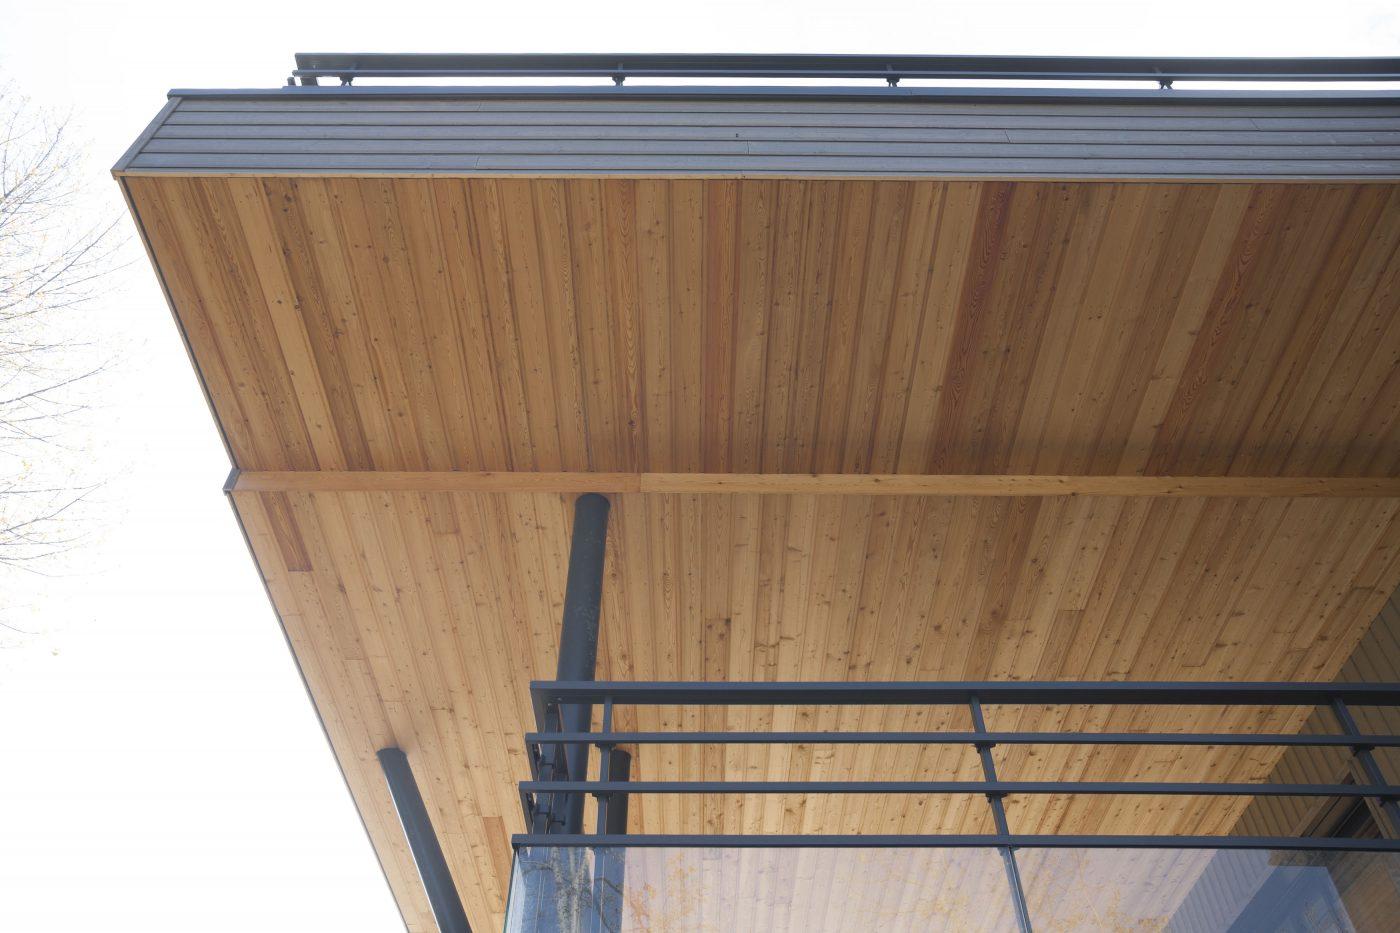 Philippe_Zerbib_Architecte_construction_maisons_ossature_bois_projet_maison_benhamou_MG_8451